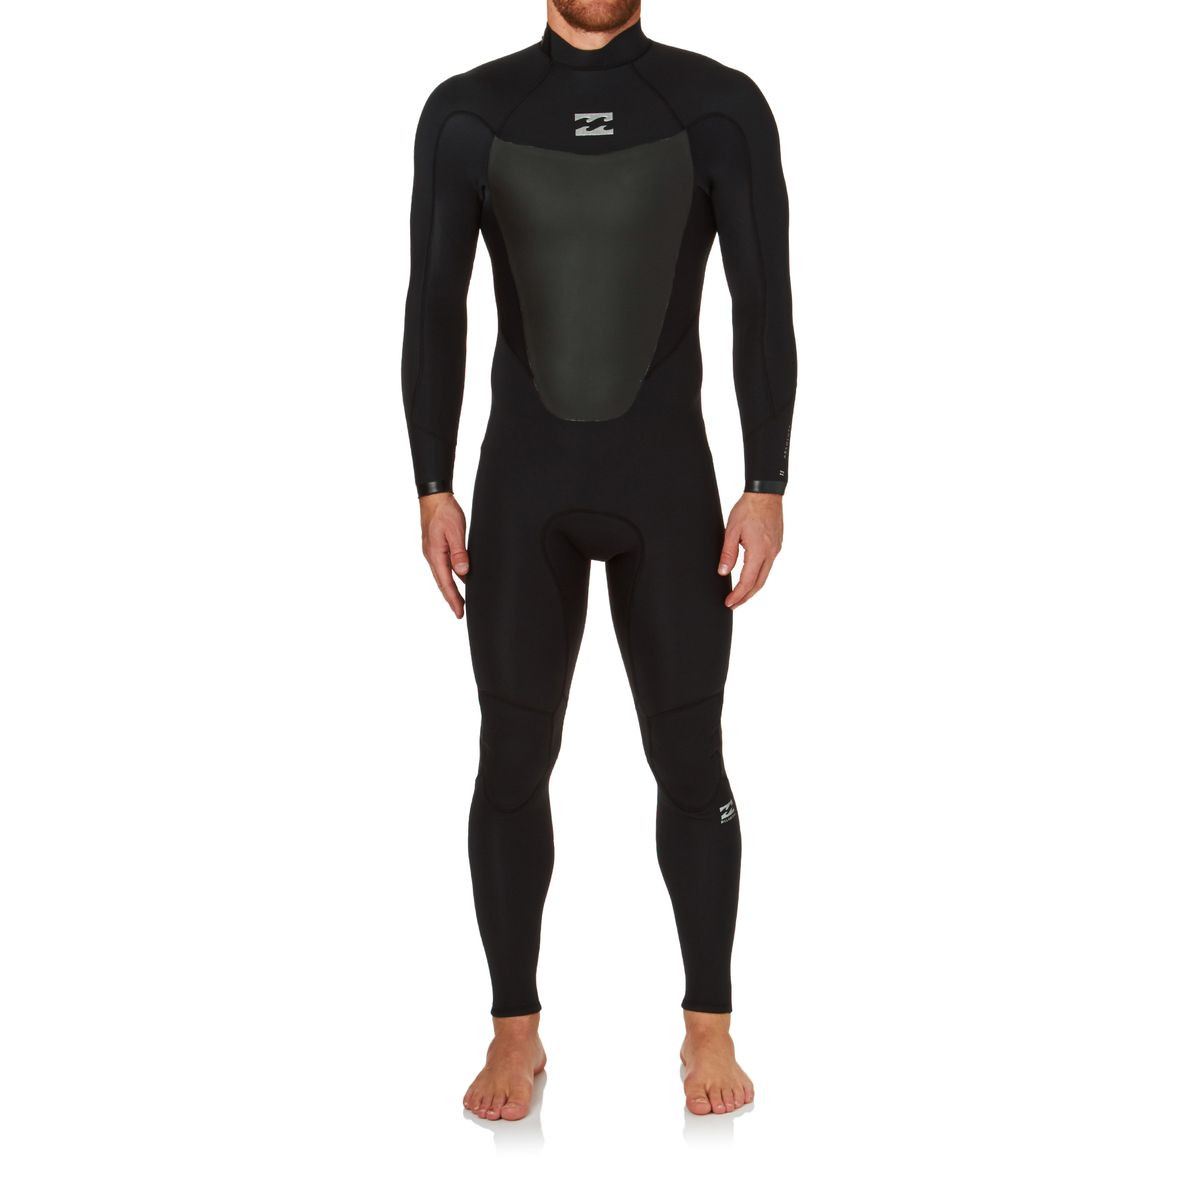 Billabong Absolute Comp 3/2mm Back Zip Wetsuit - Black